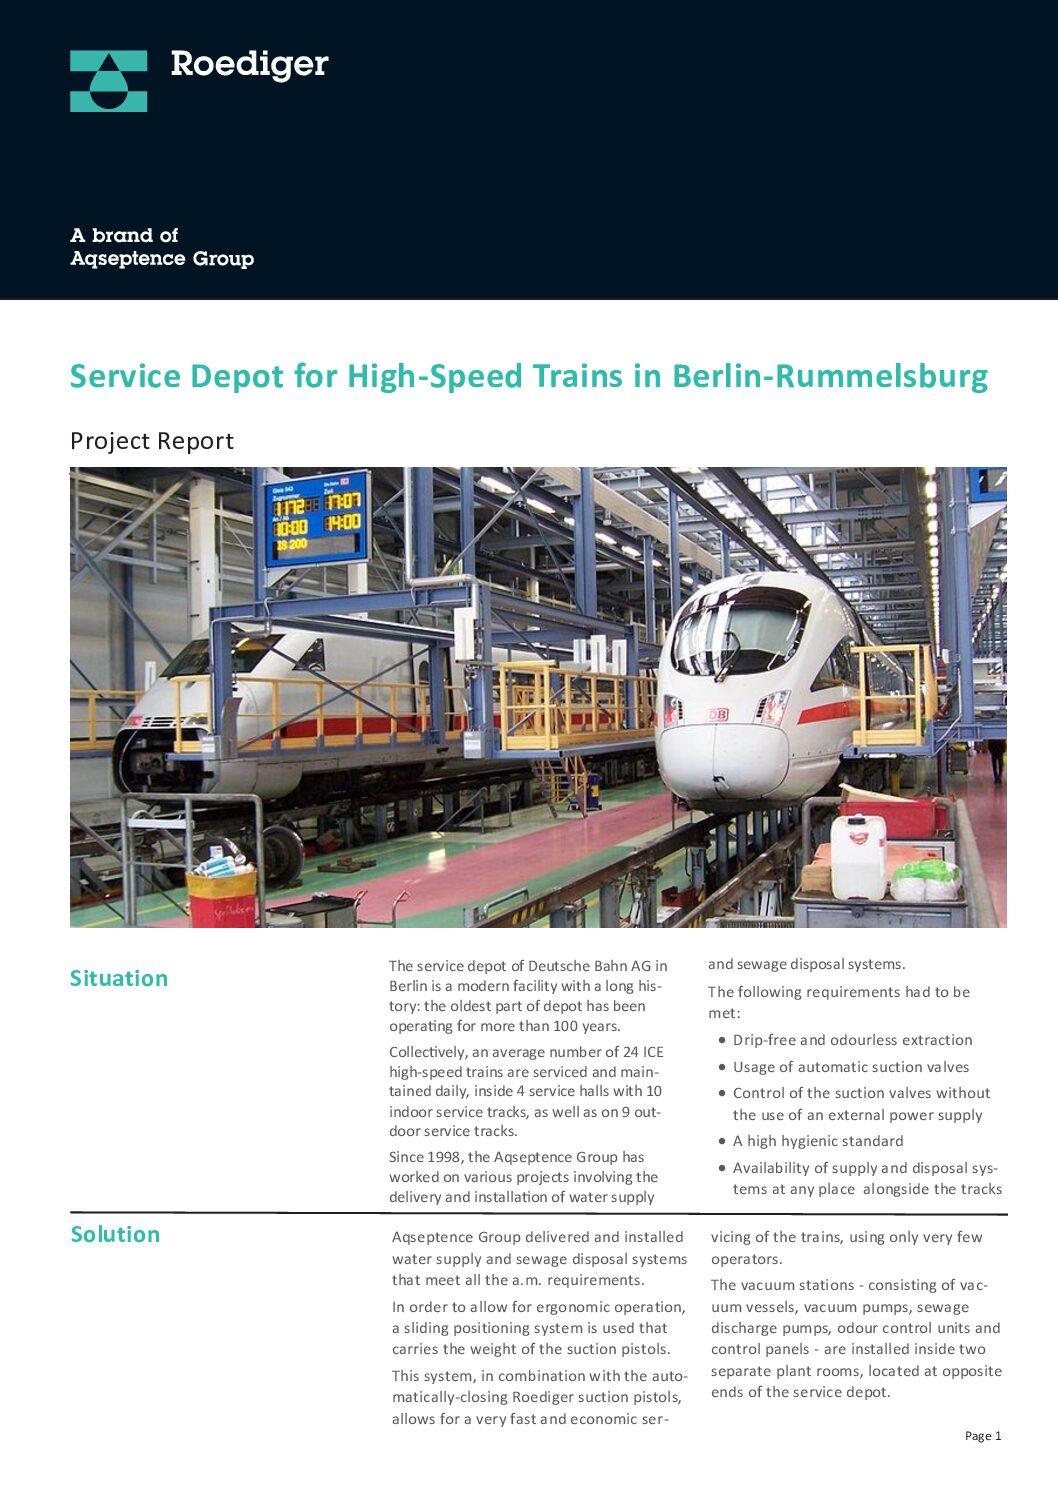 Case Study: Service Depot of Deutsche Bahn AG